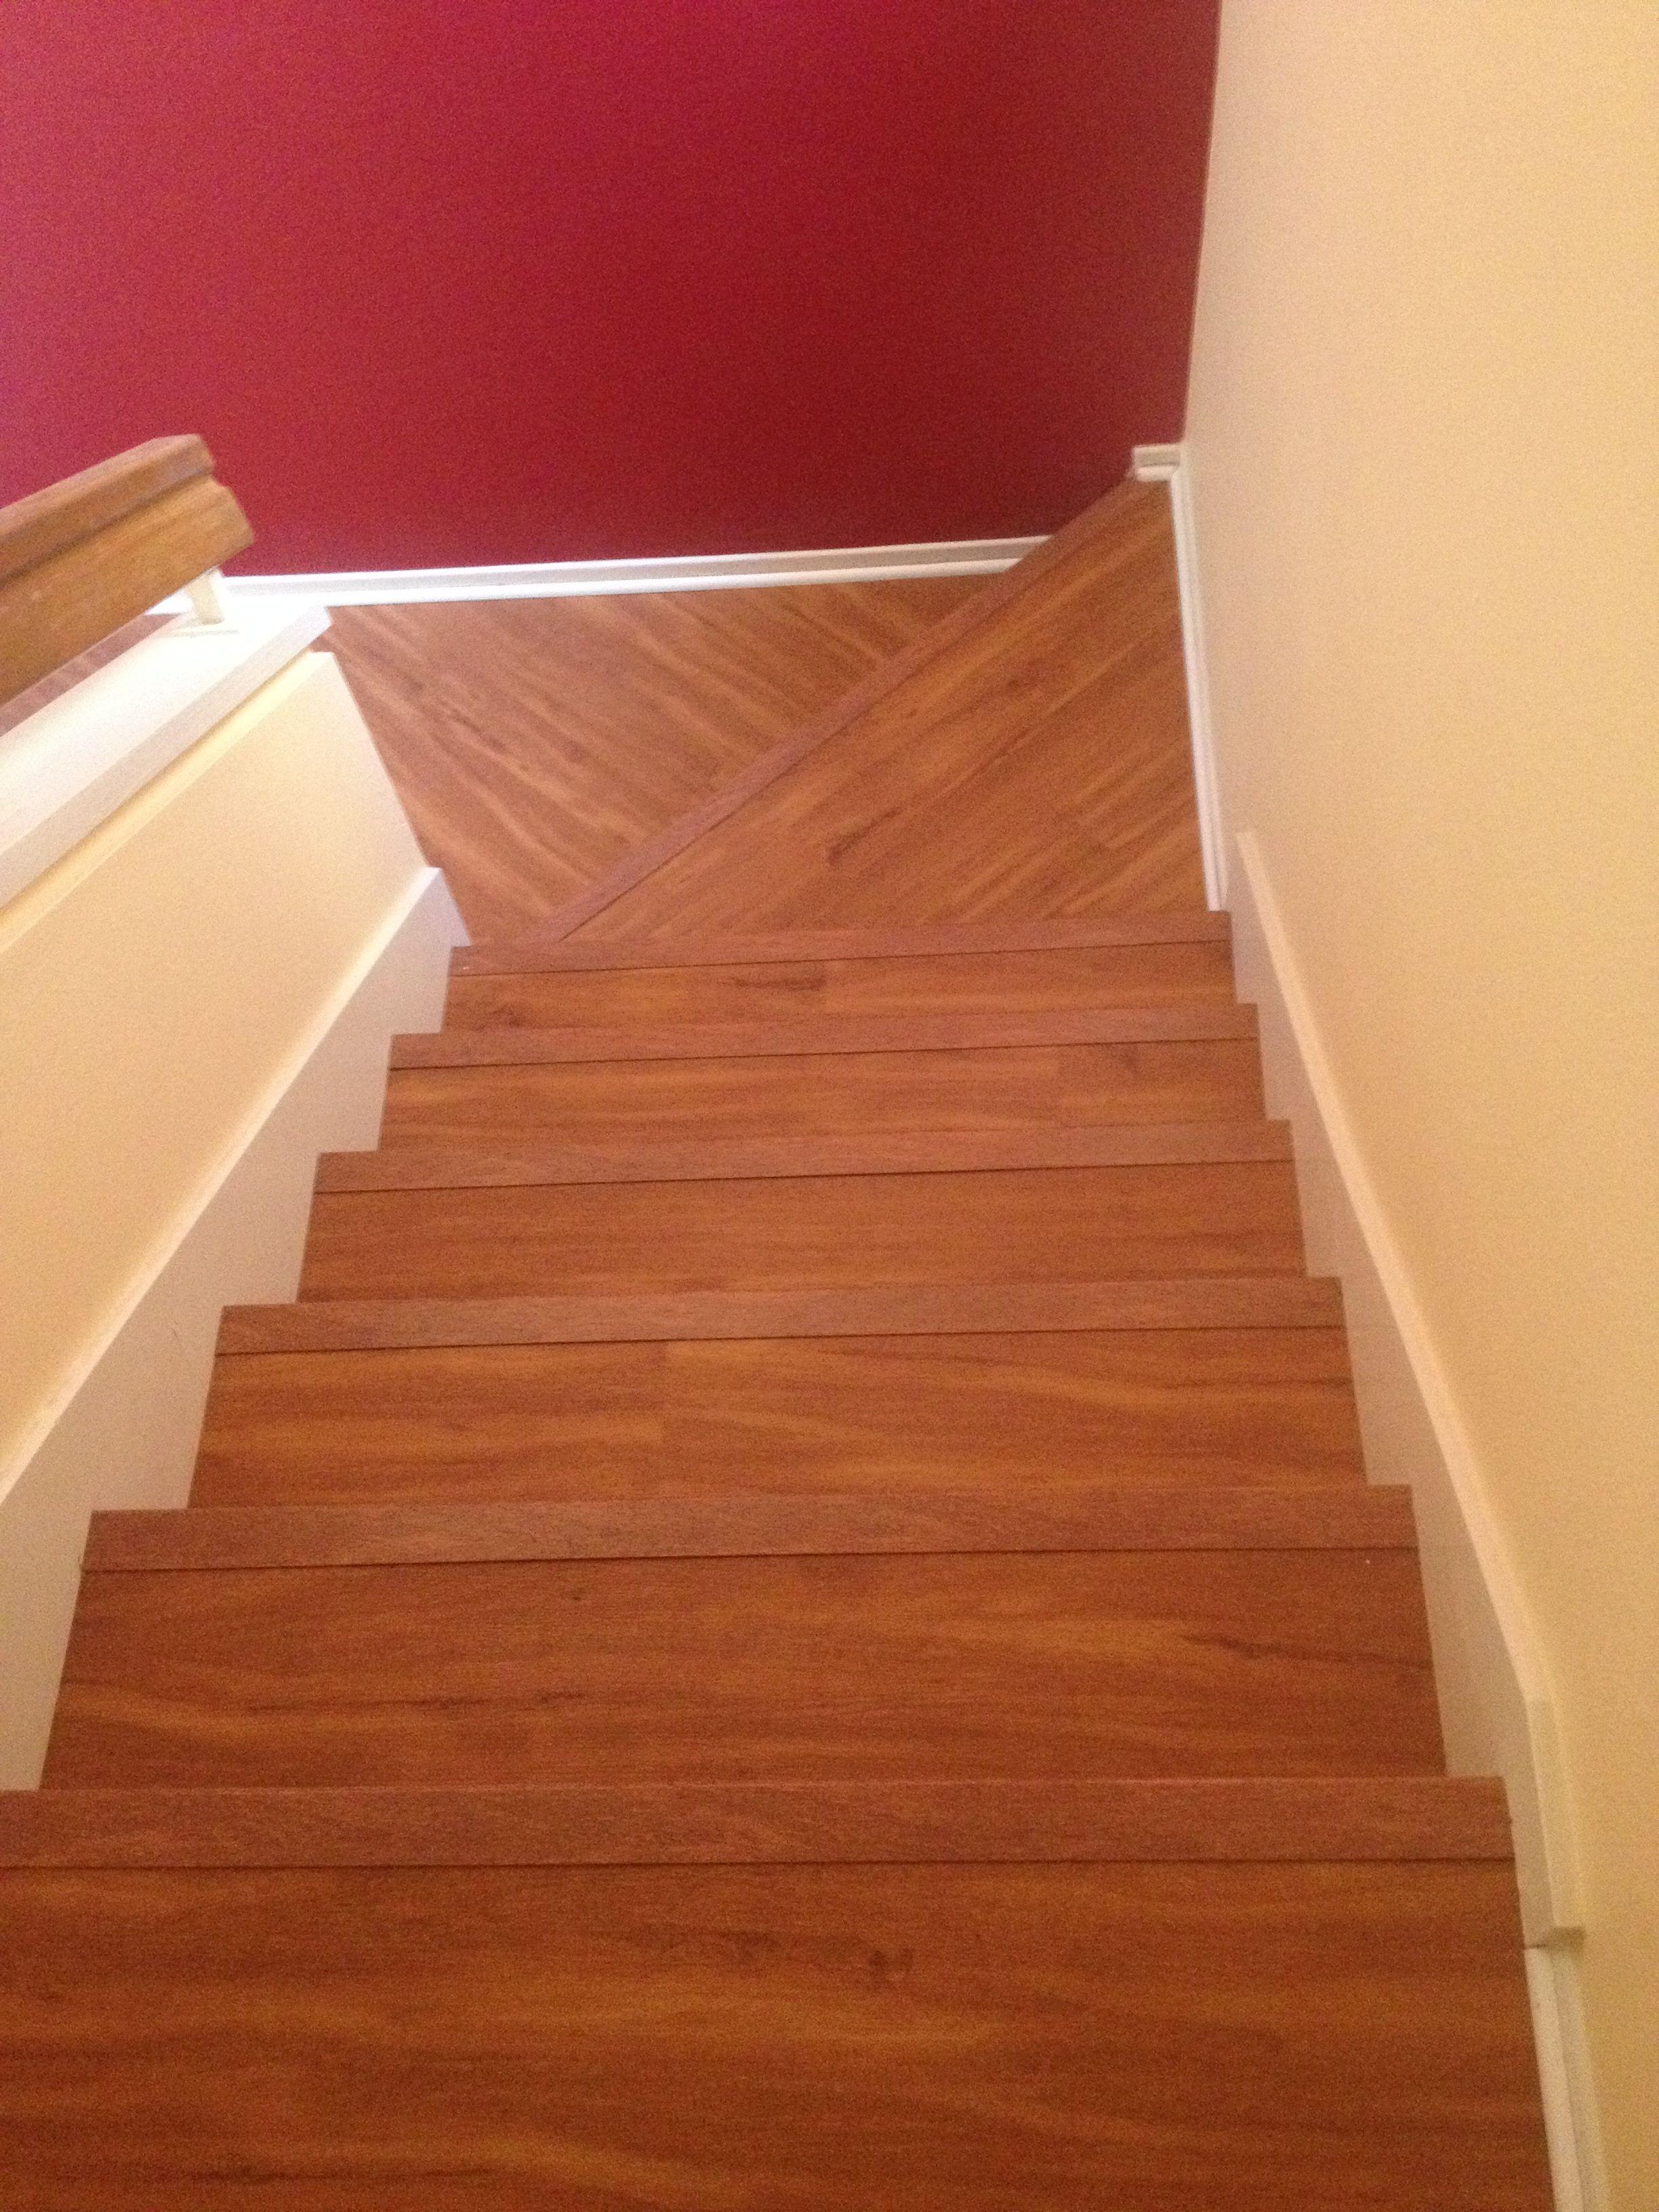 Karndean LVT plank floor installed for a client in Irvine CA Used